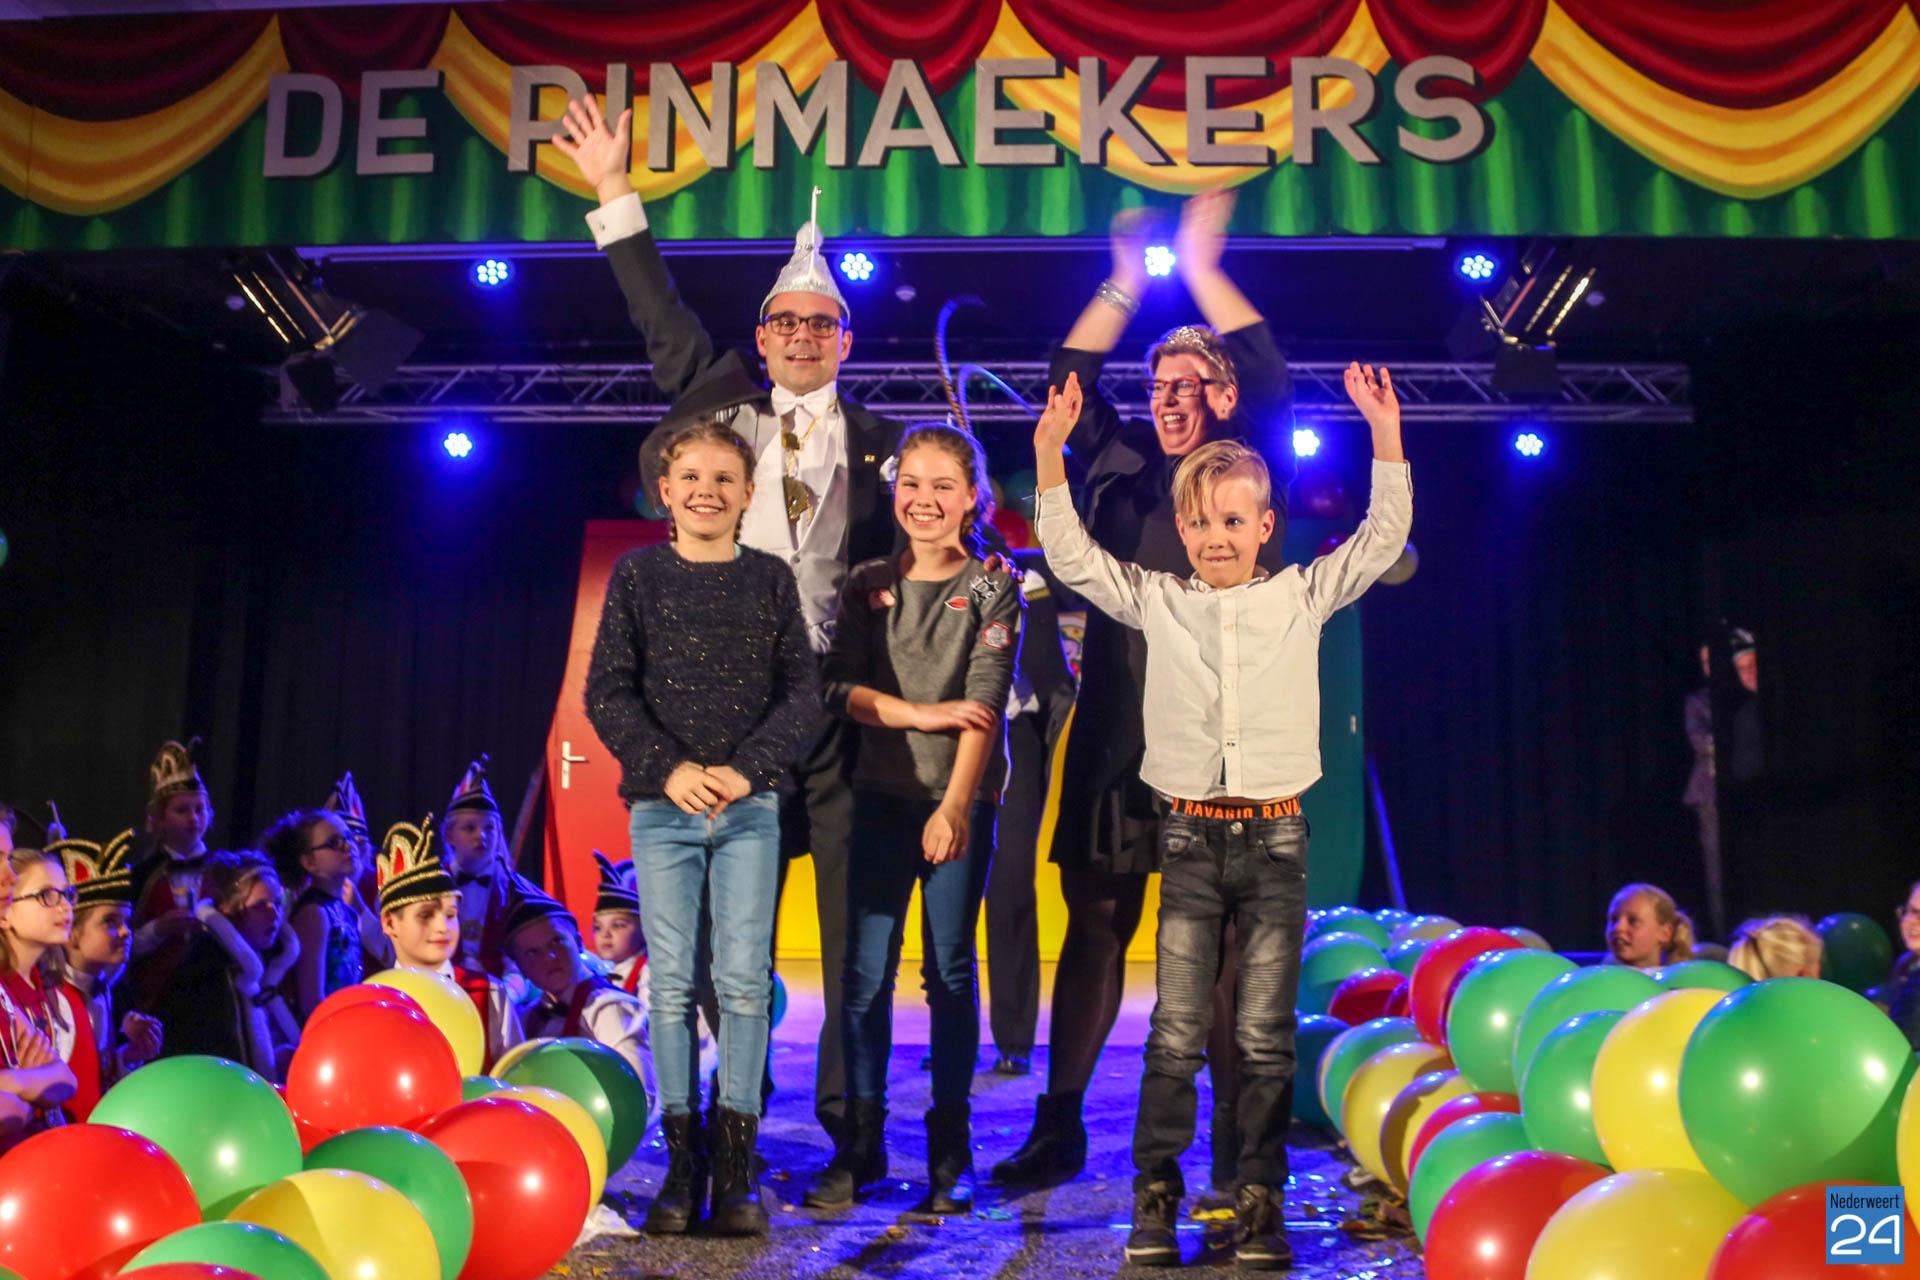 cv de pinmaekers Harm Kuijpers prins van V.V. de Pinmaekers (Foto's)   Nederweert24